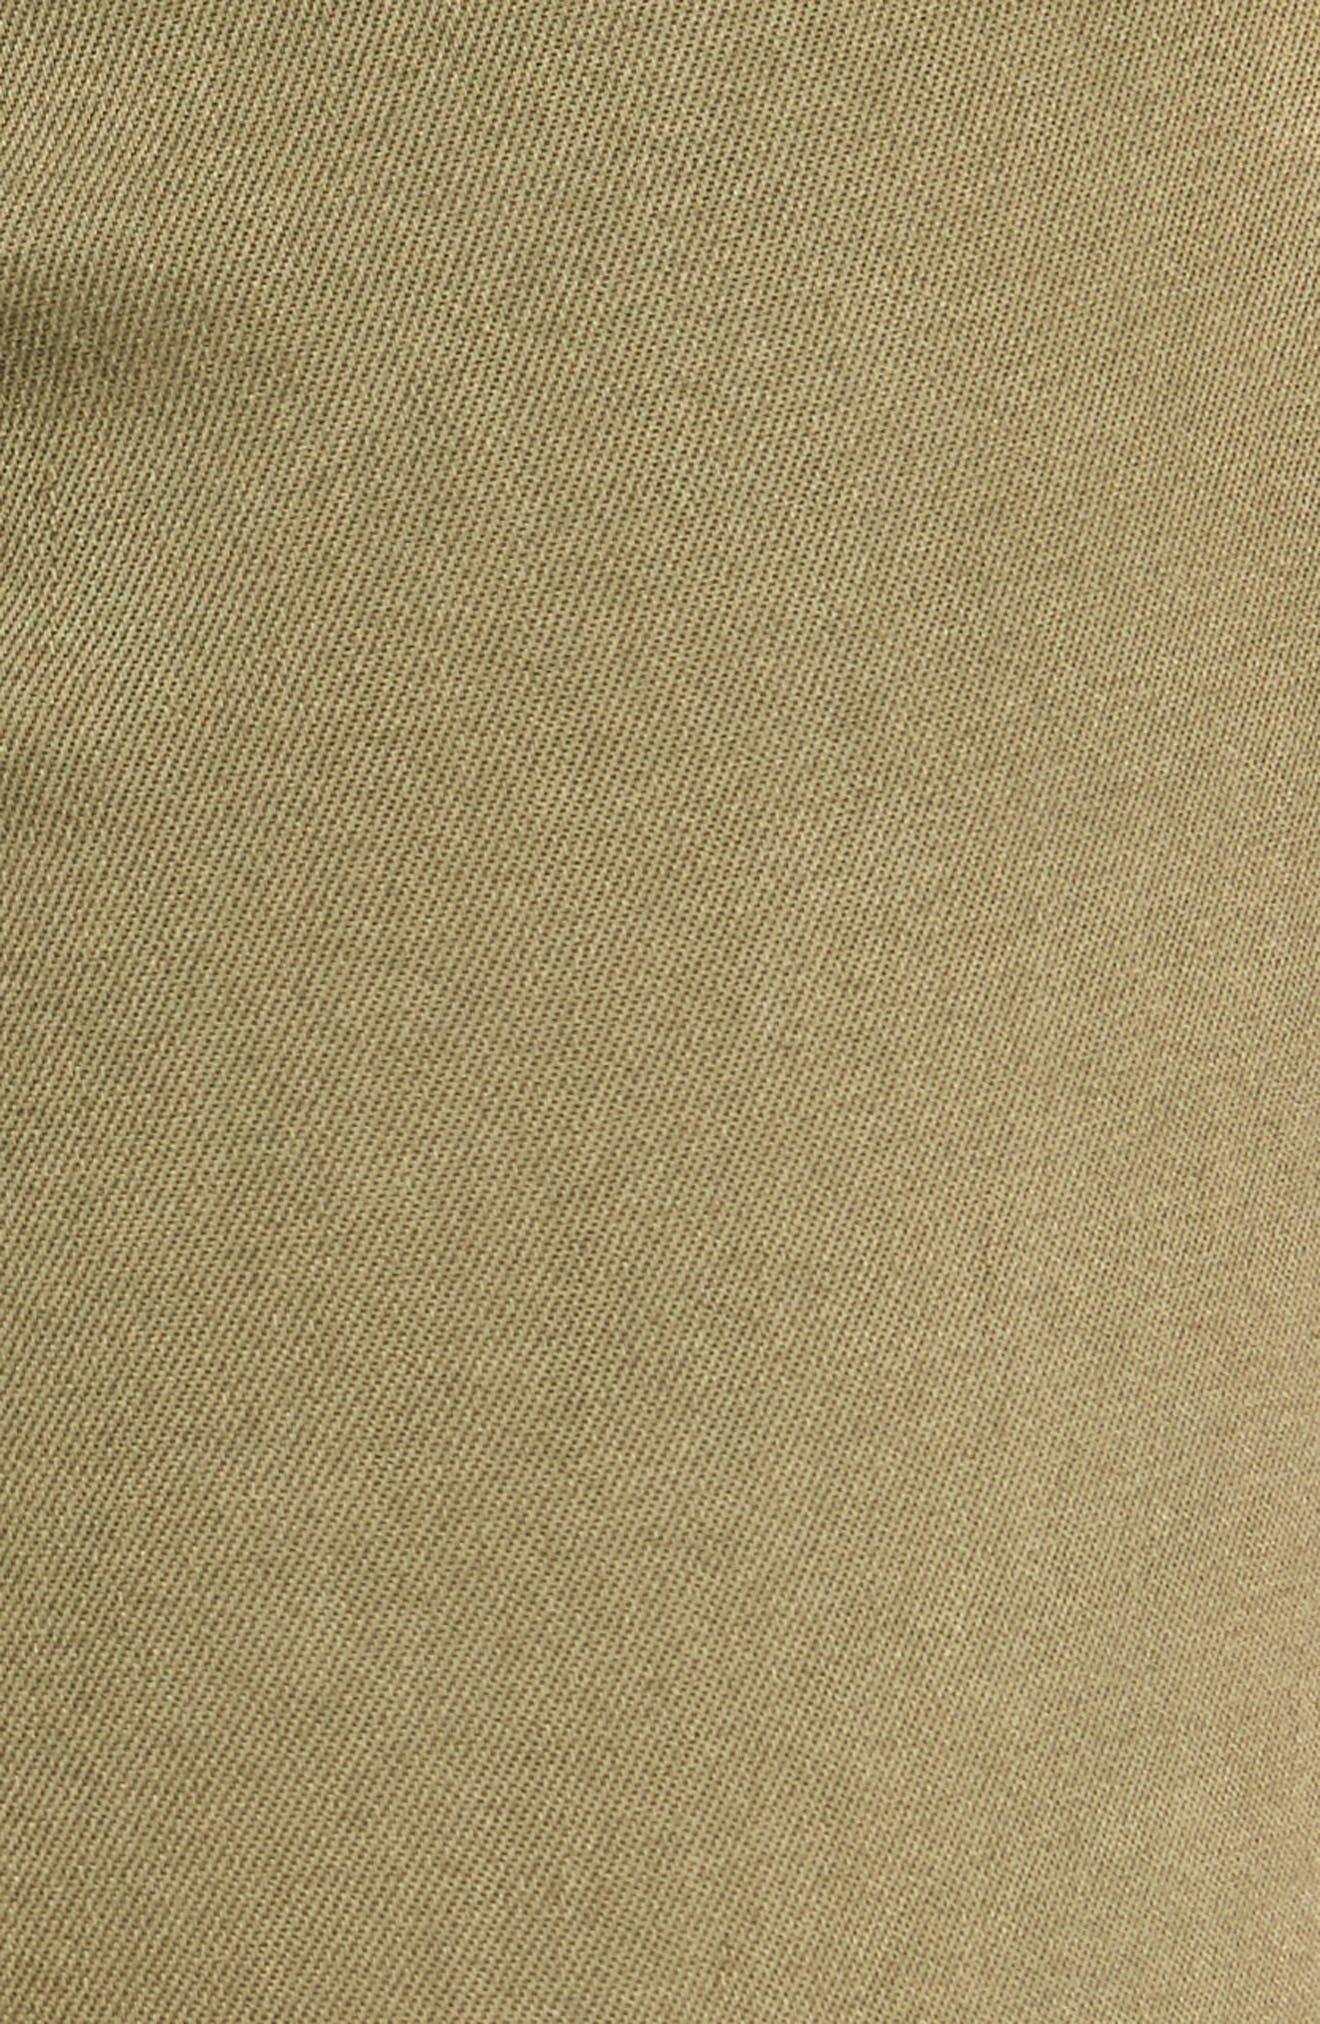 Skinny Cargo Pants,                             Alternate thumbnail 5, color,                             Olive